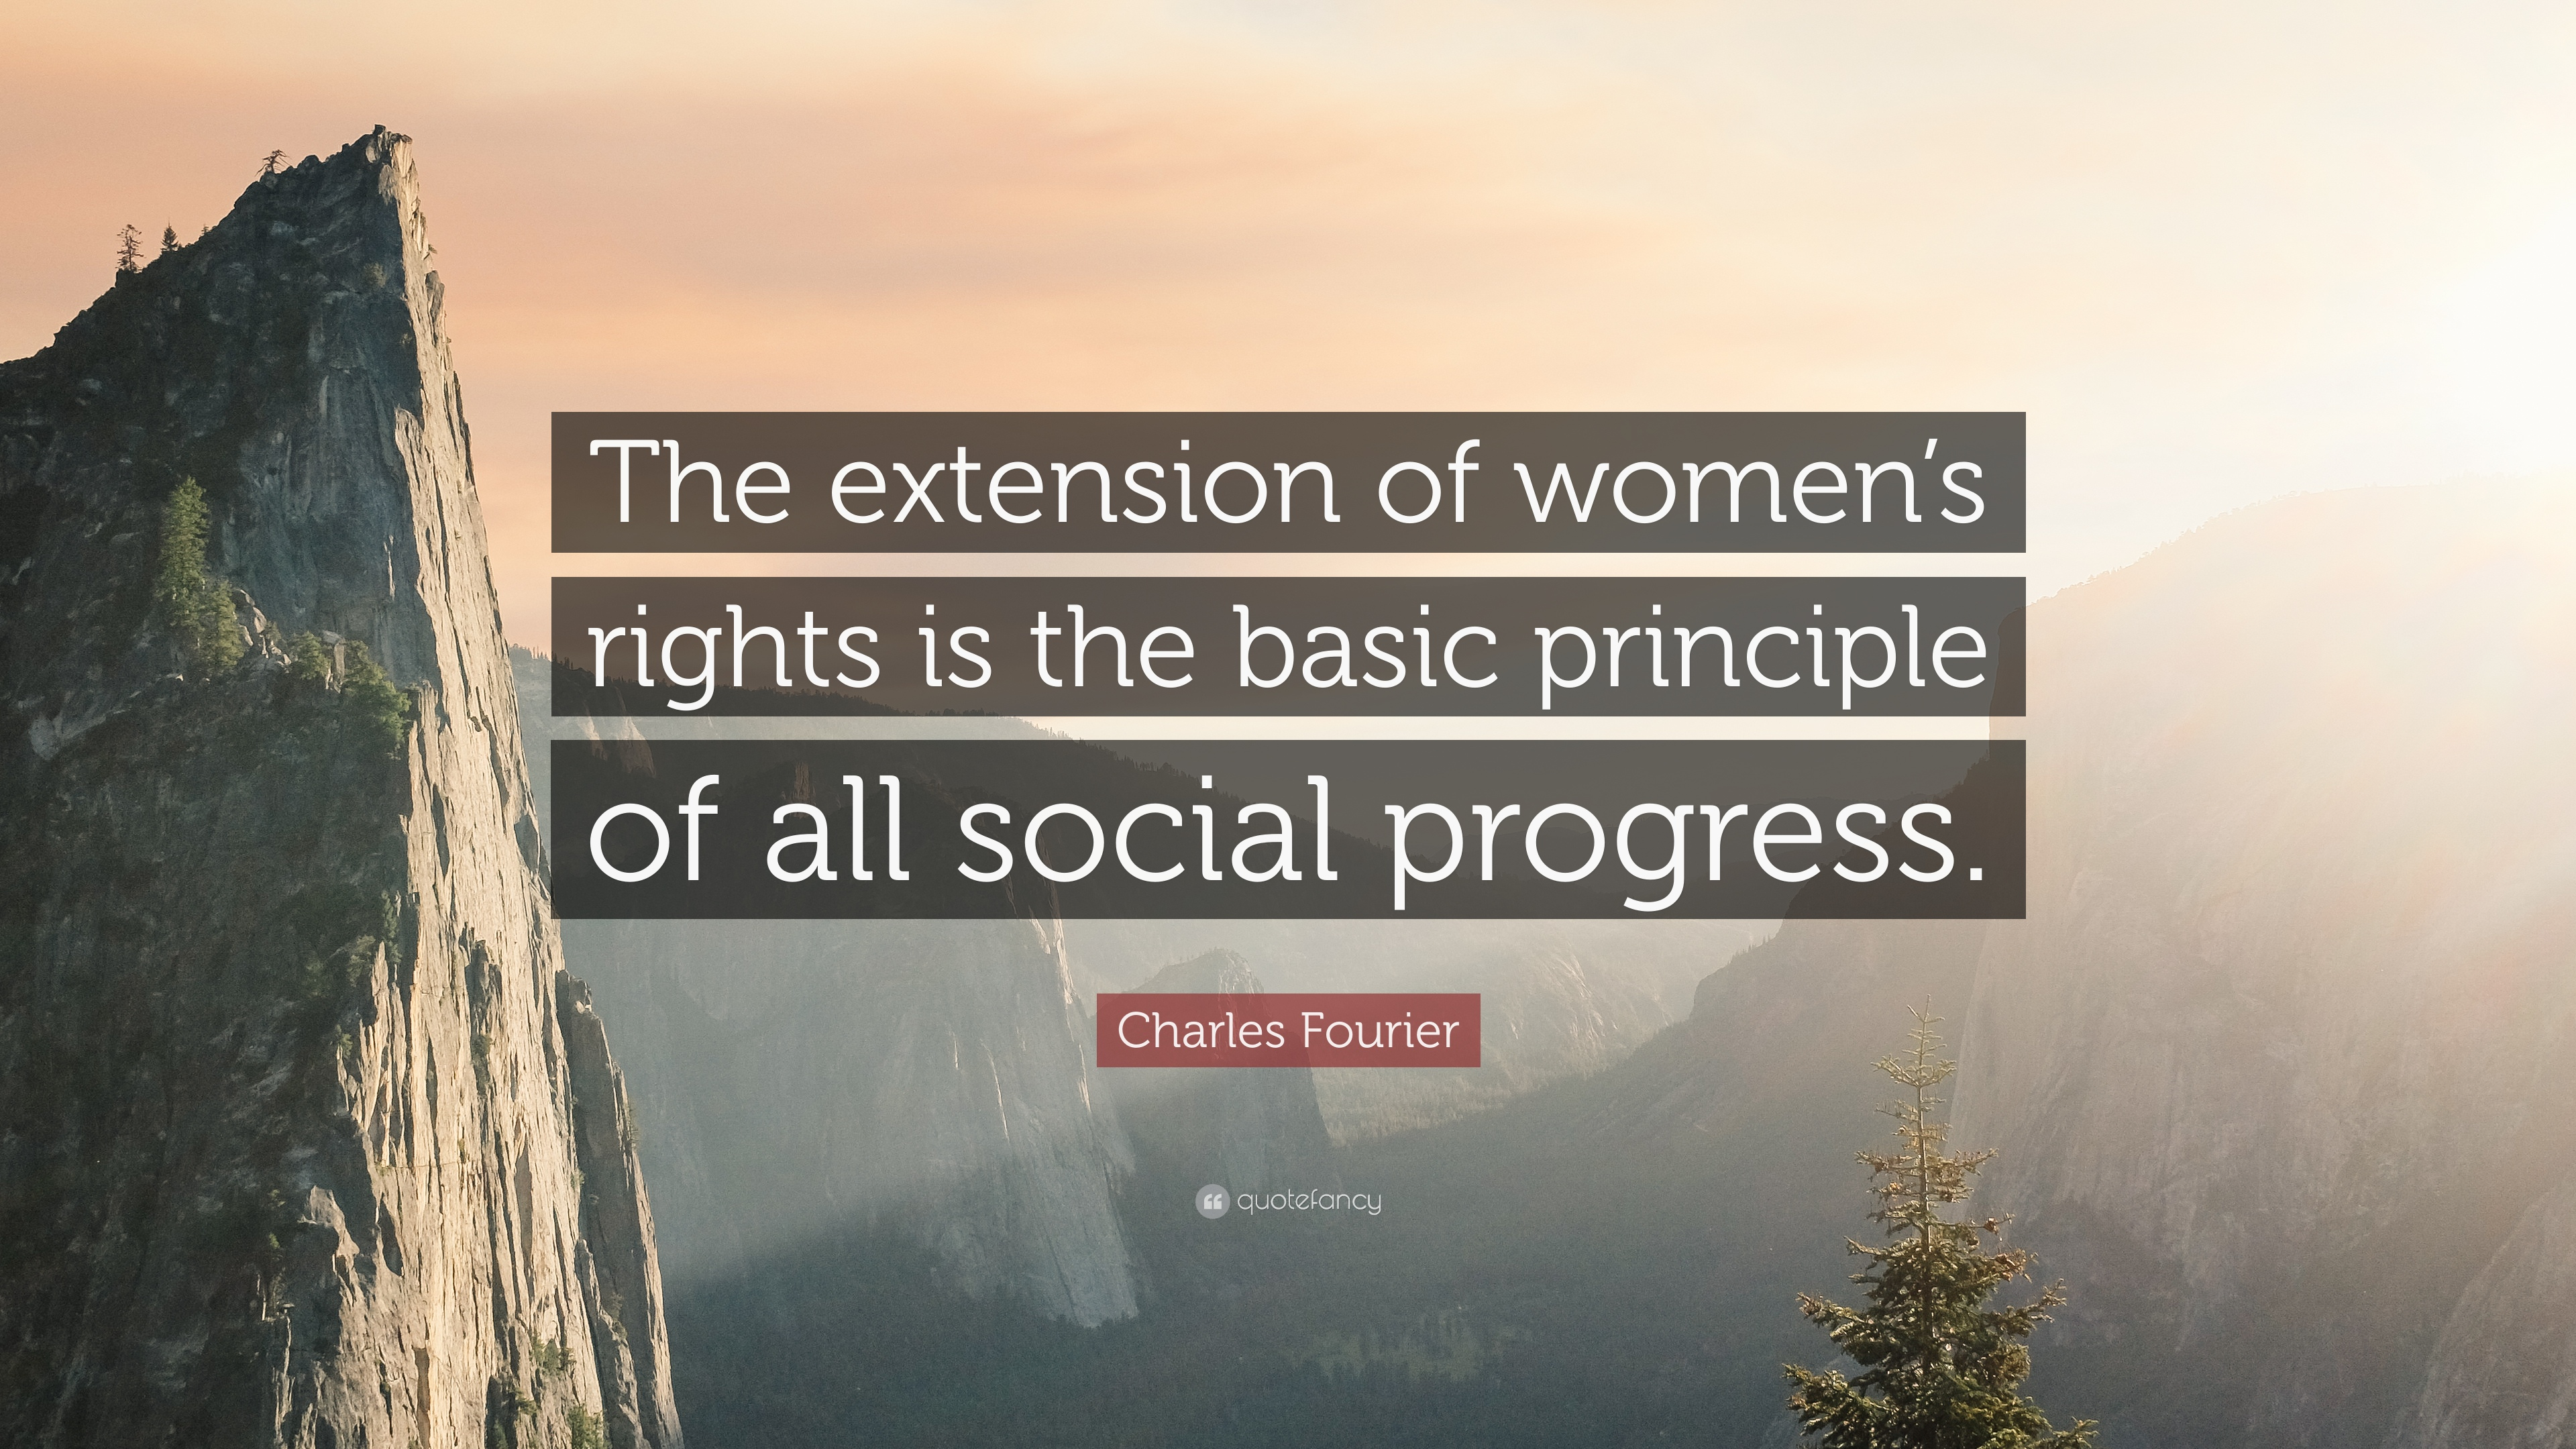 The general principles of corporate social